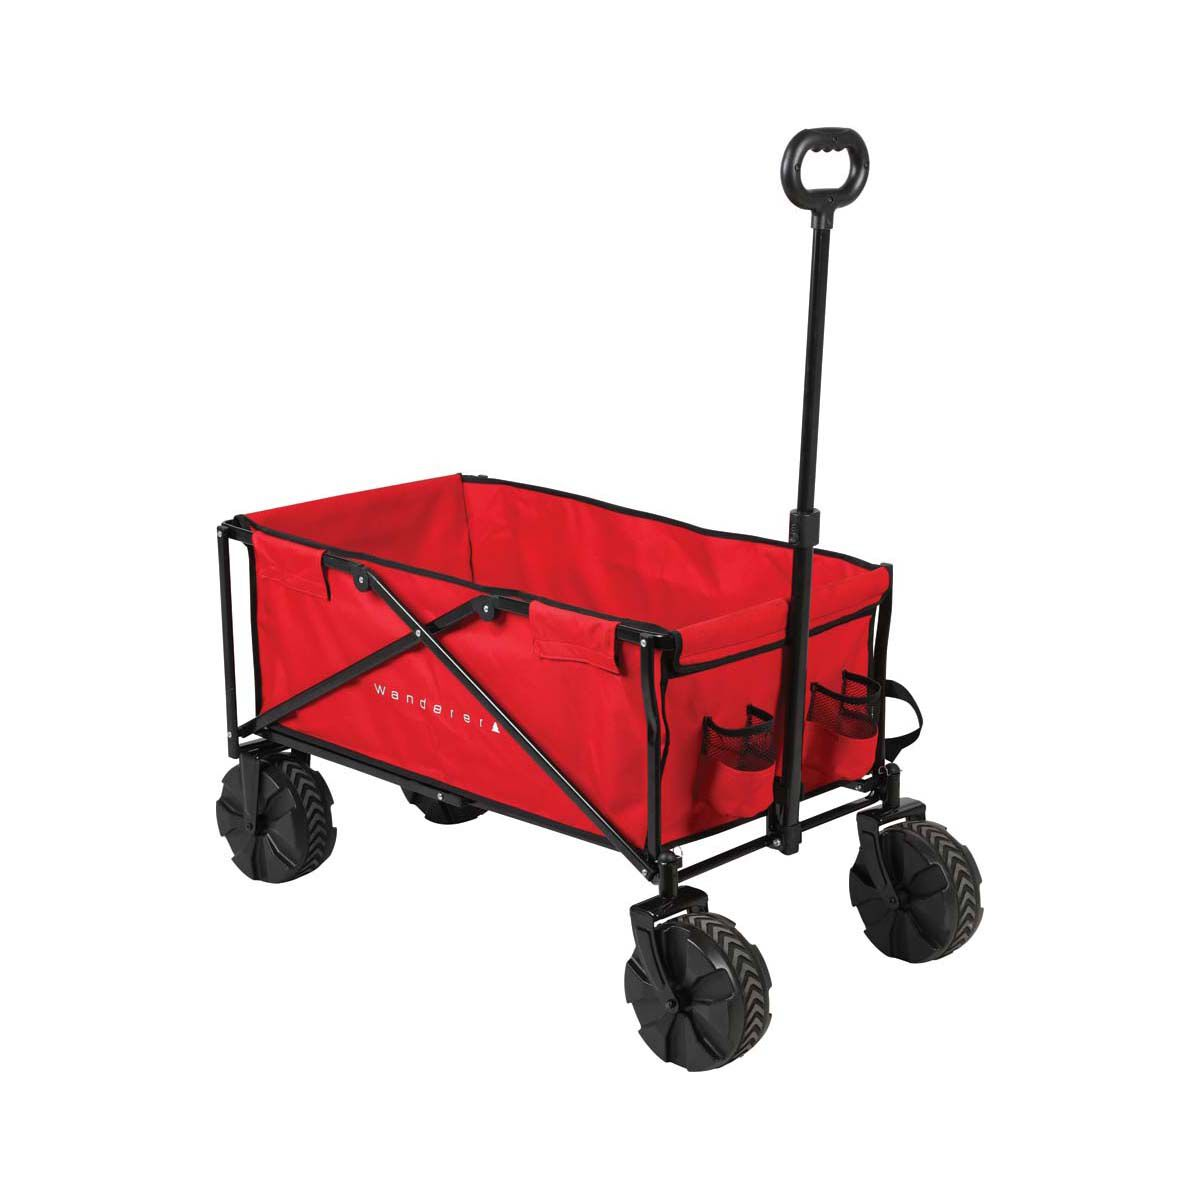 Pier Cart Wagon for Beach Surf Plastic Wheels Rod Holders Cooler Surface Rack